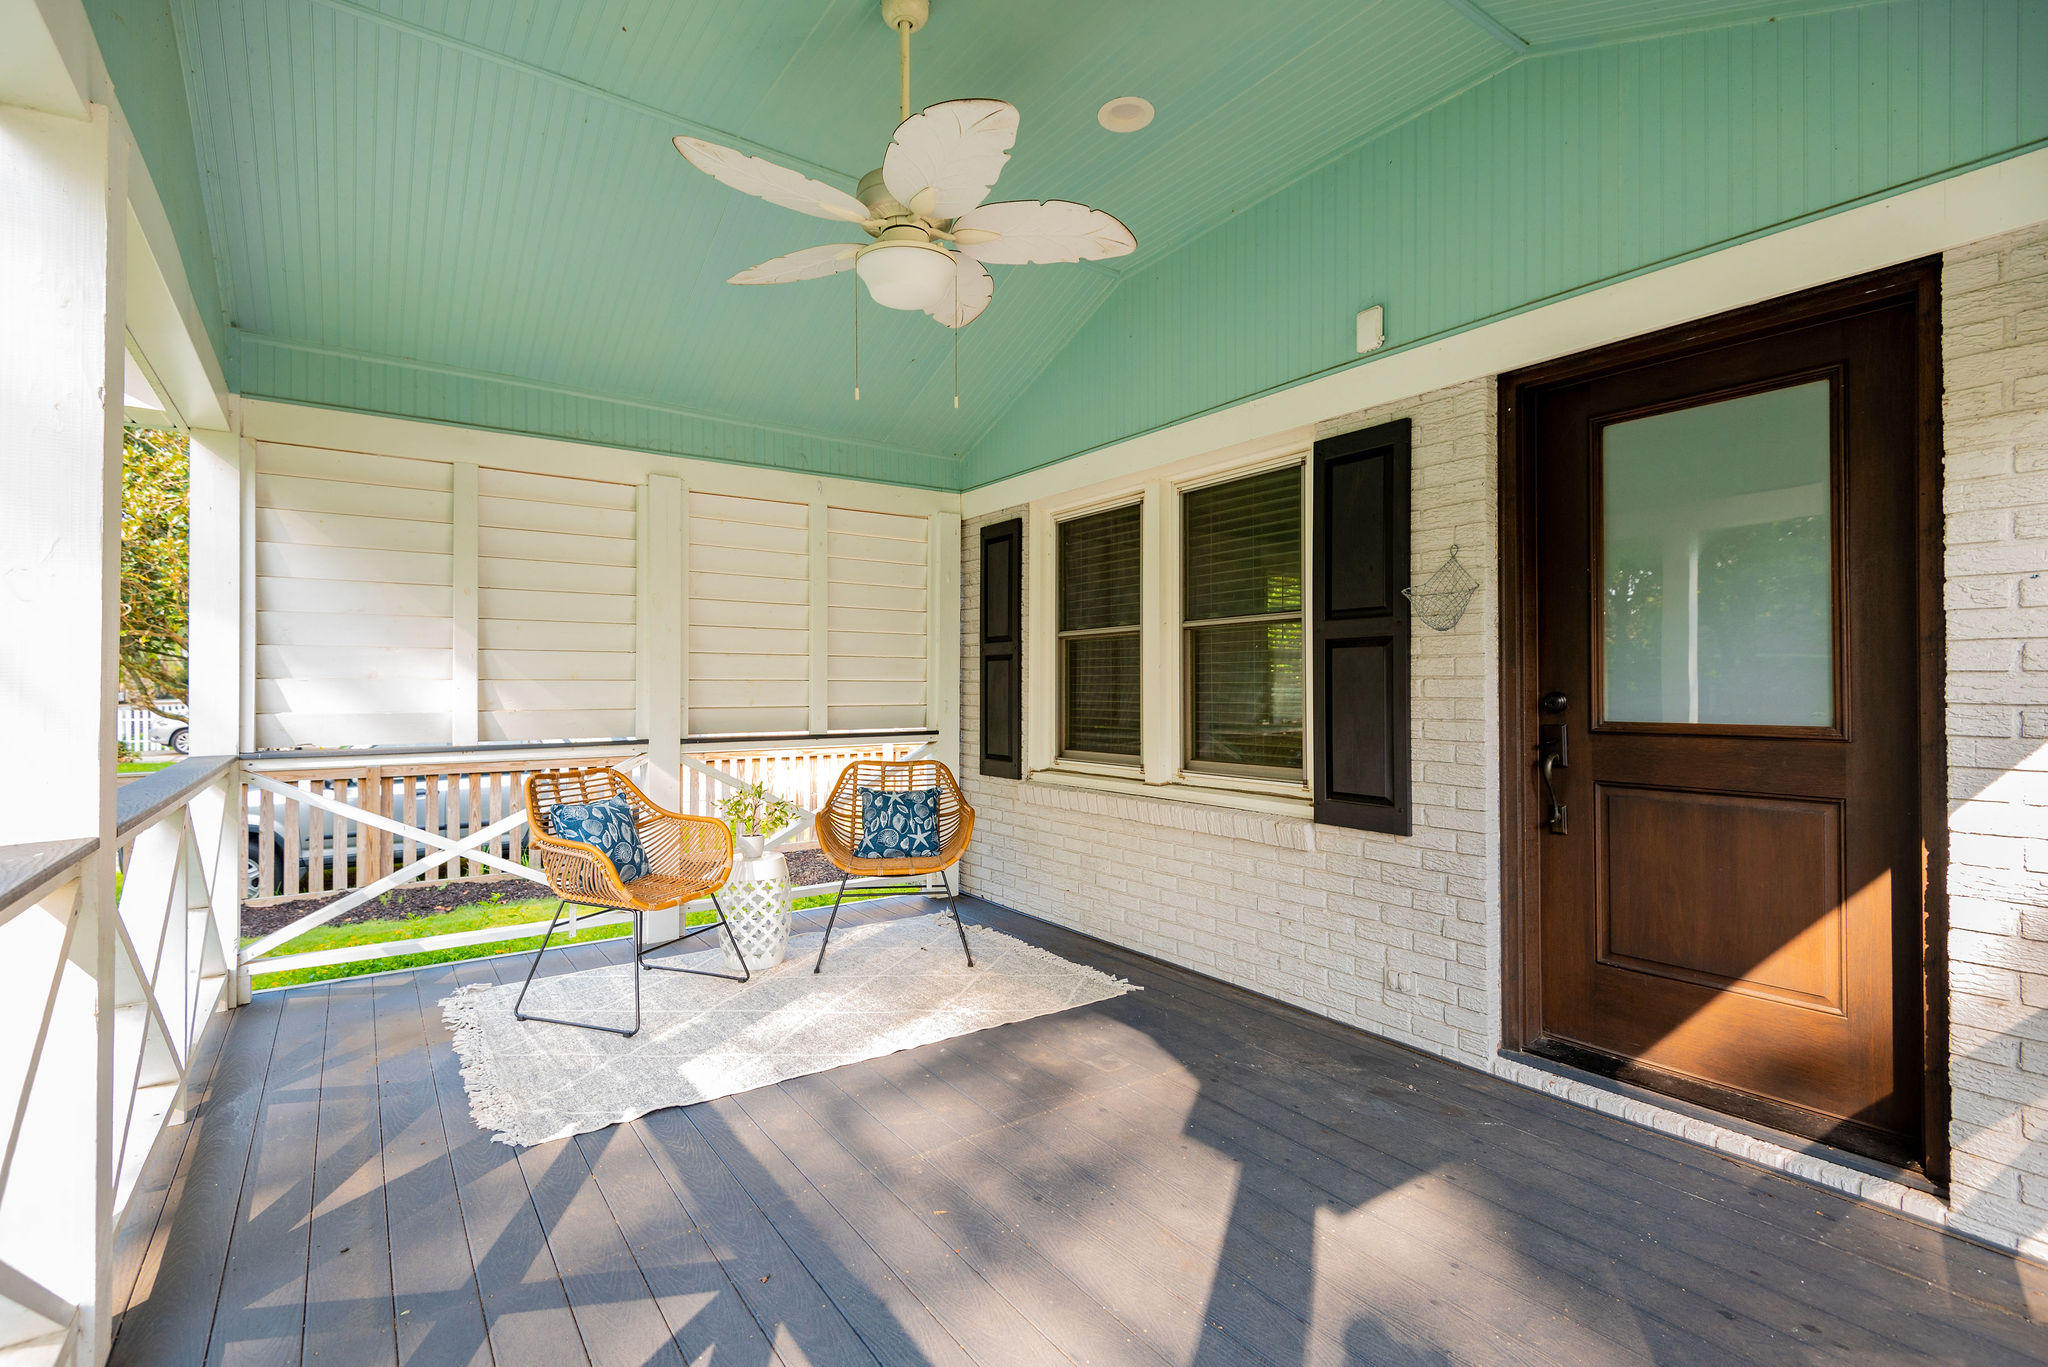 Old Mt Pleasant Homes For Sale - 914 Center, Mount Pleasant, SC - 1